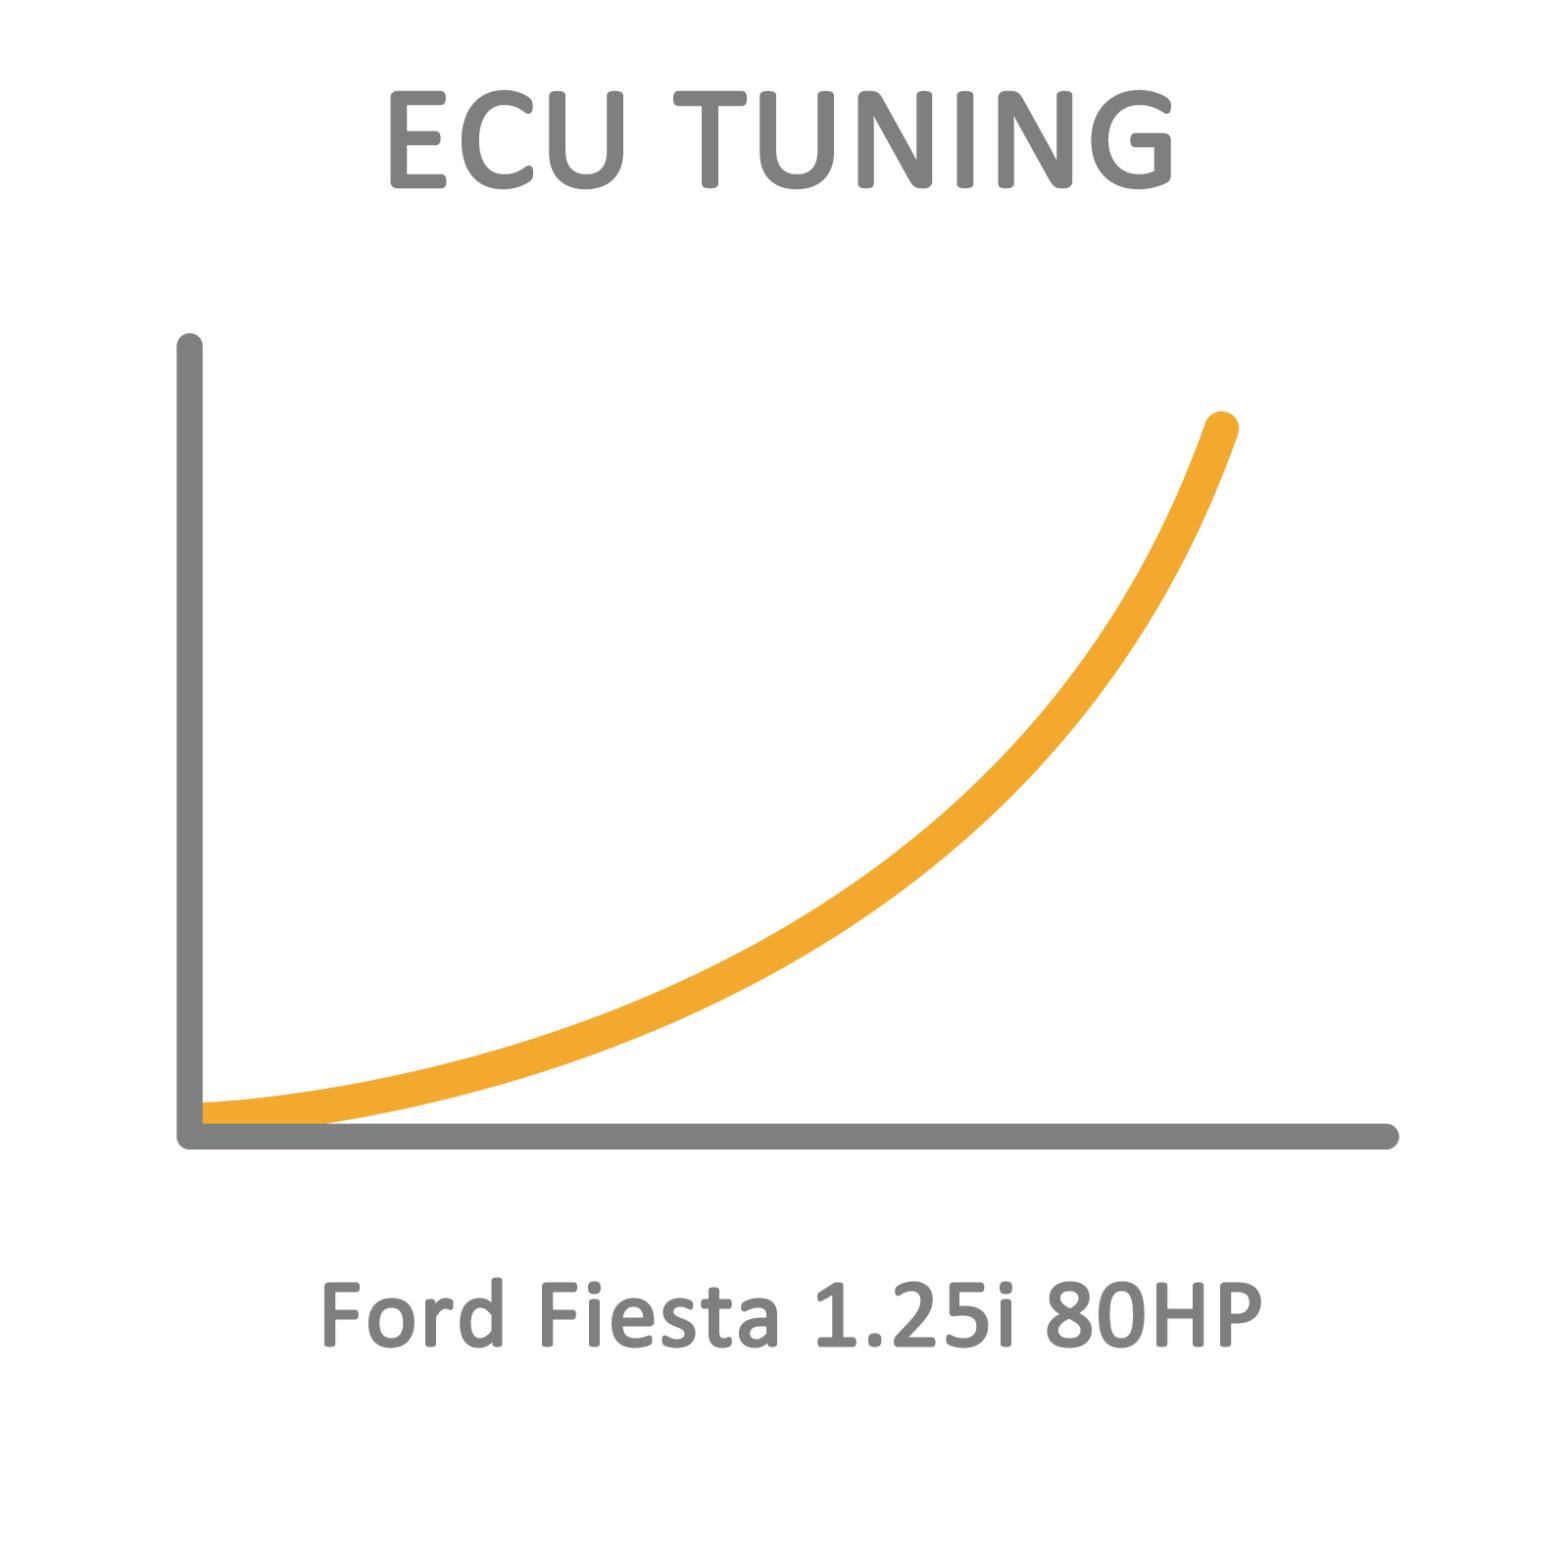 Ford Fiesta 1.25i 80HP ECU Tuning Remapping Programming